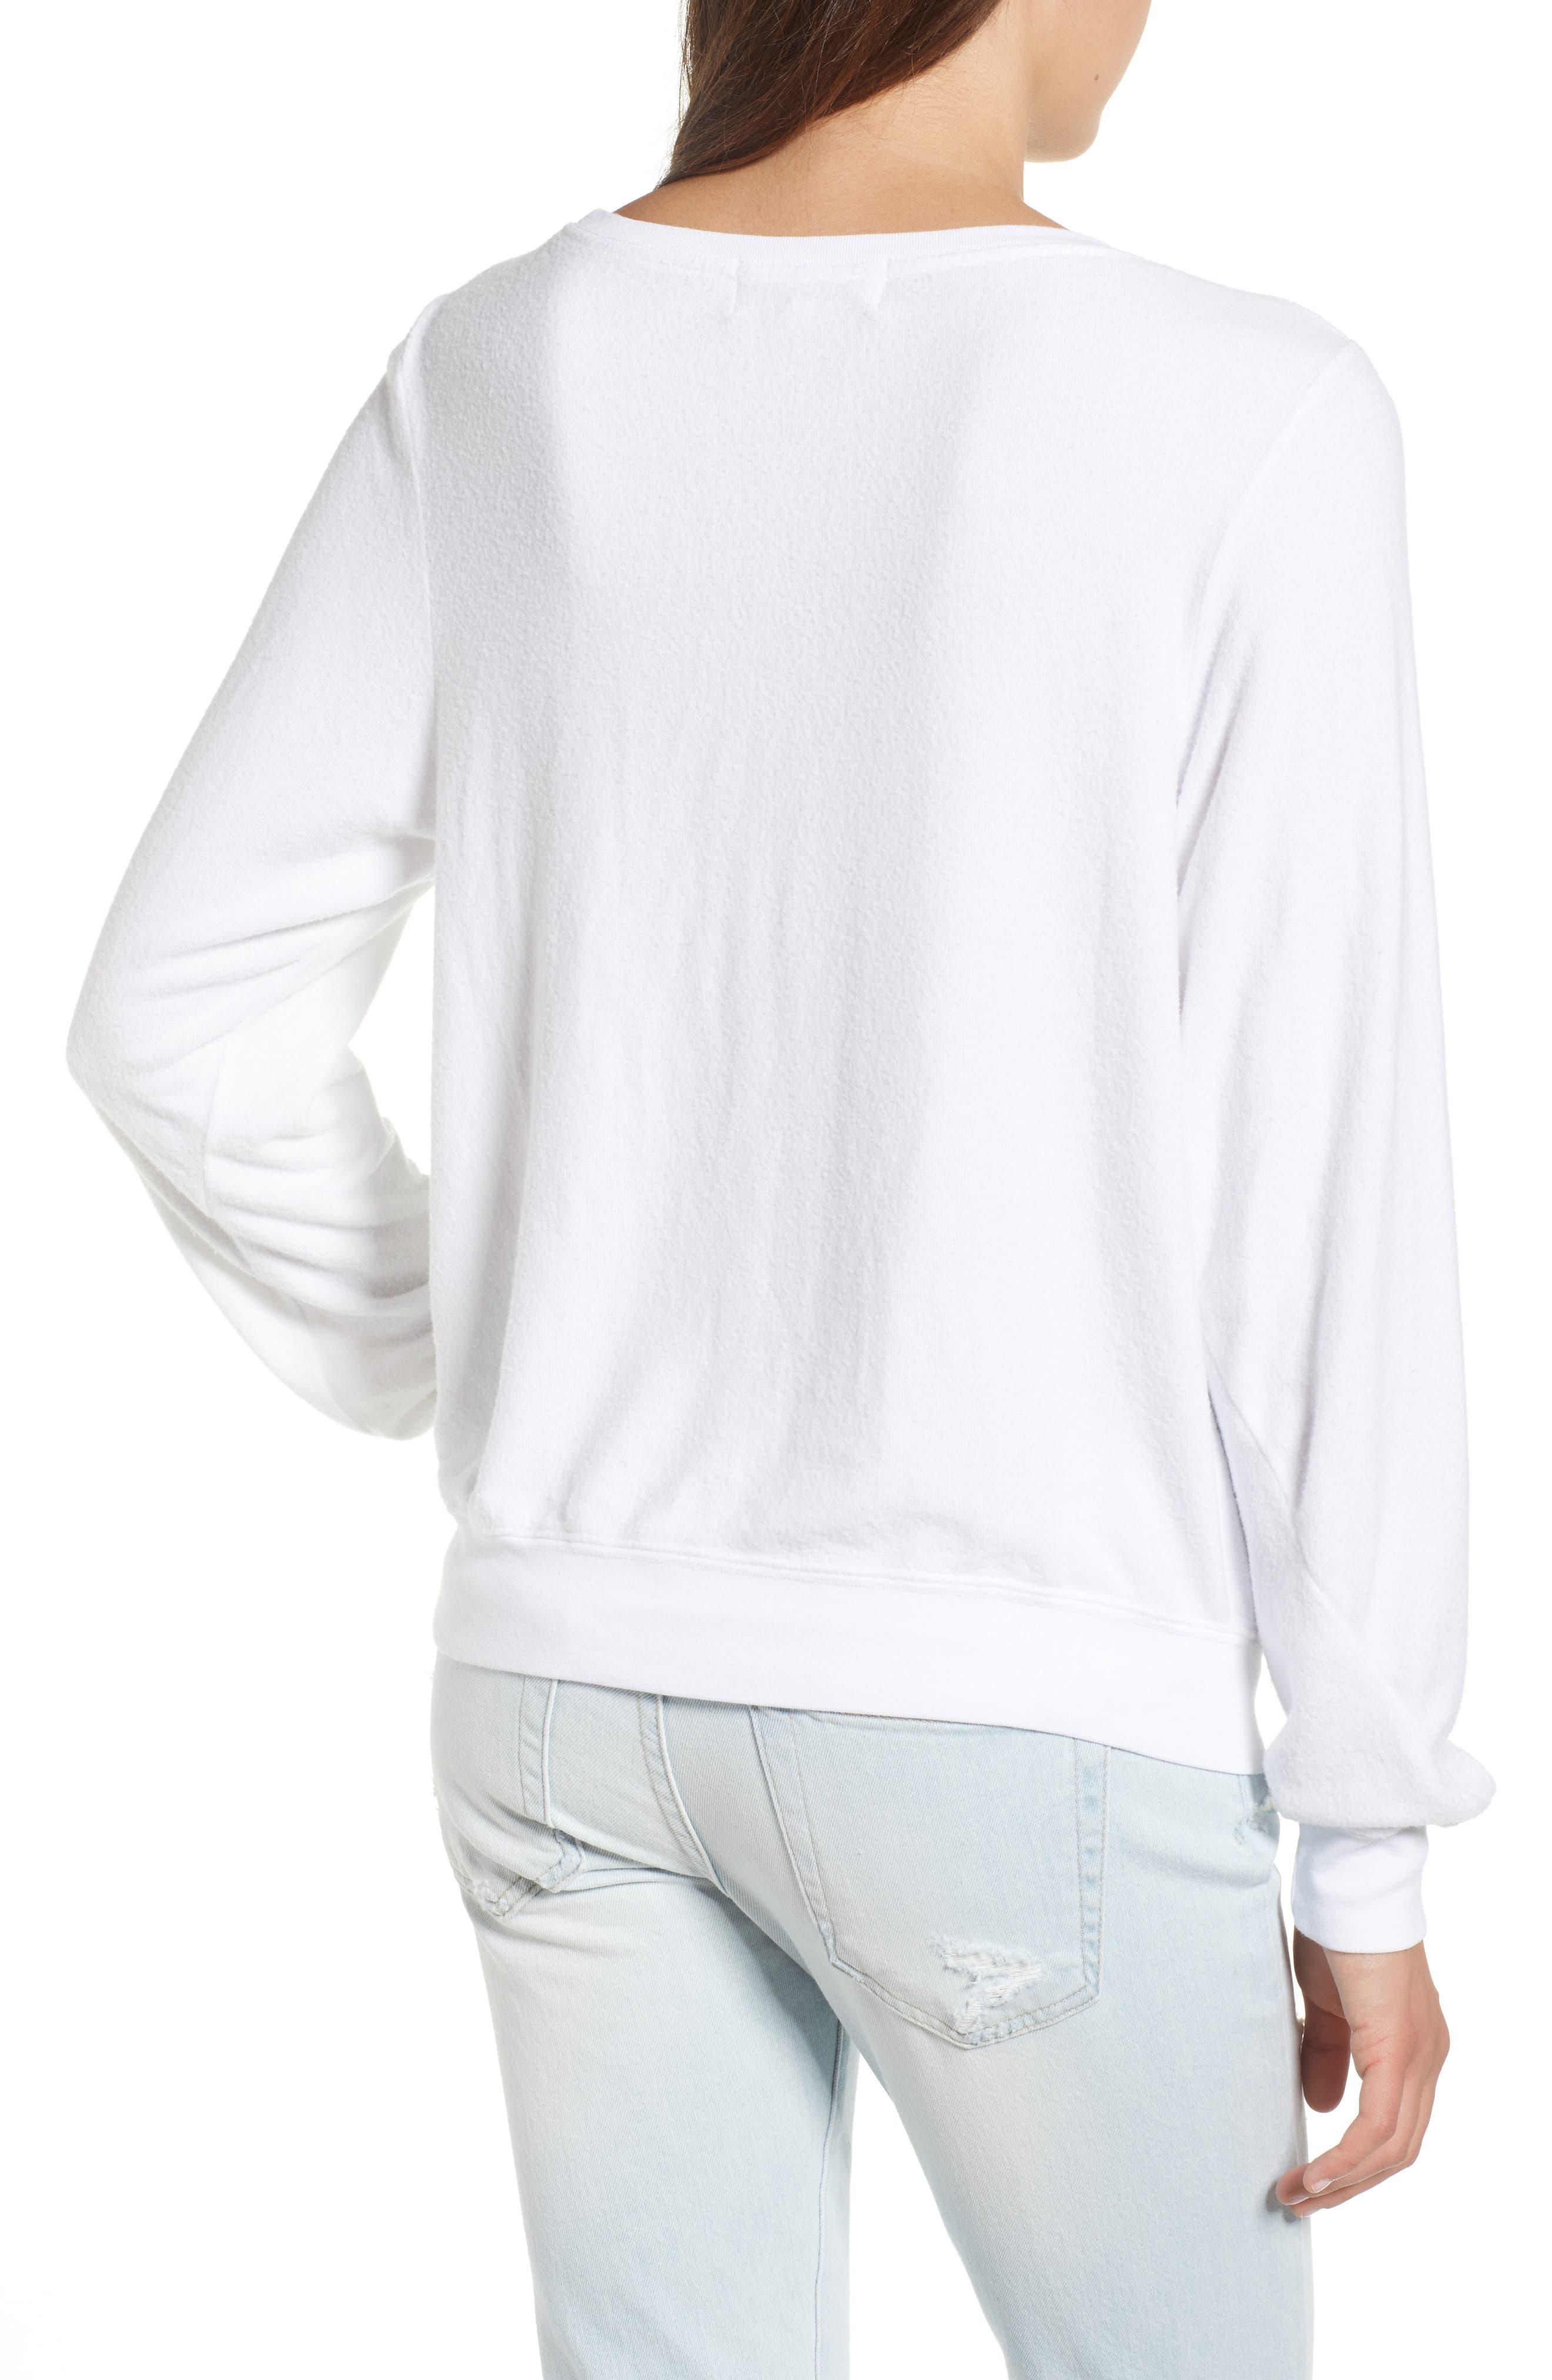 Be Happy Sweatshirt,                             Alternate thumbnail 2, color,                             Clean White